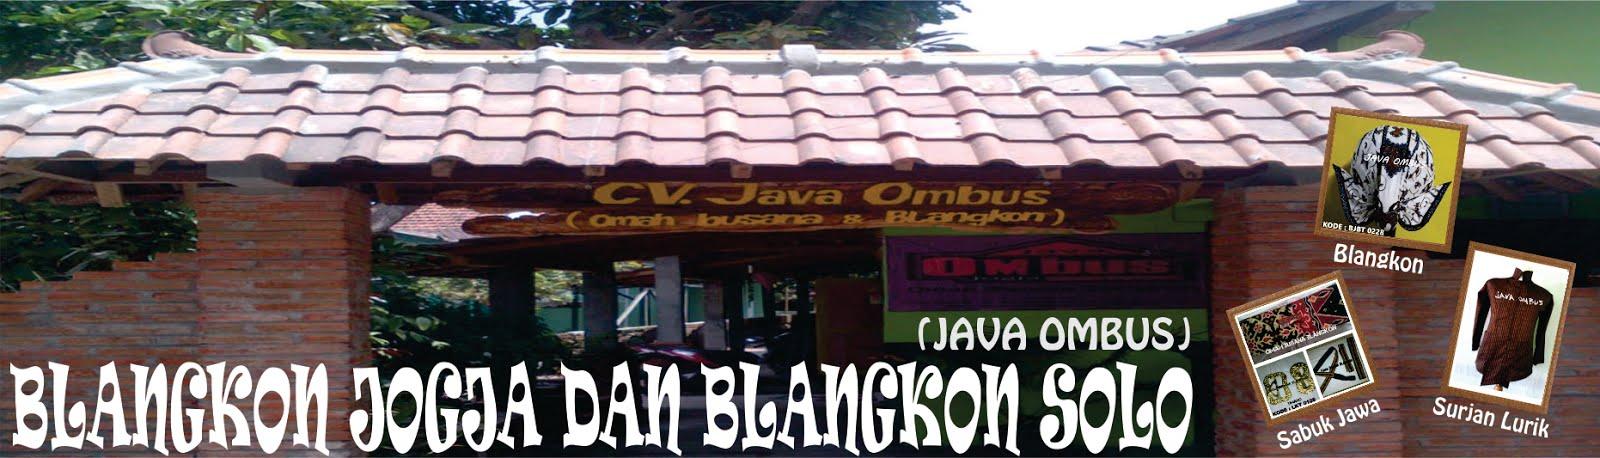 BLANGKON JOGJA DAN BLANGKON SOLO (Java Ombus)